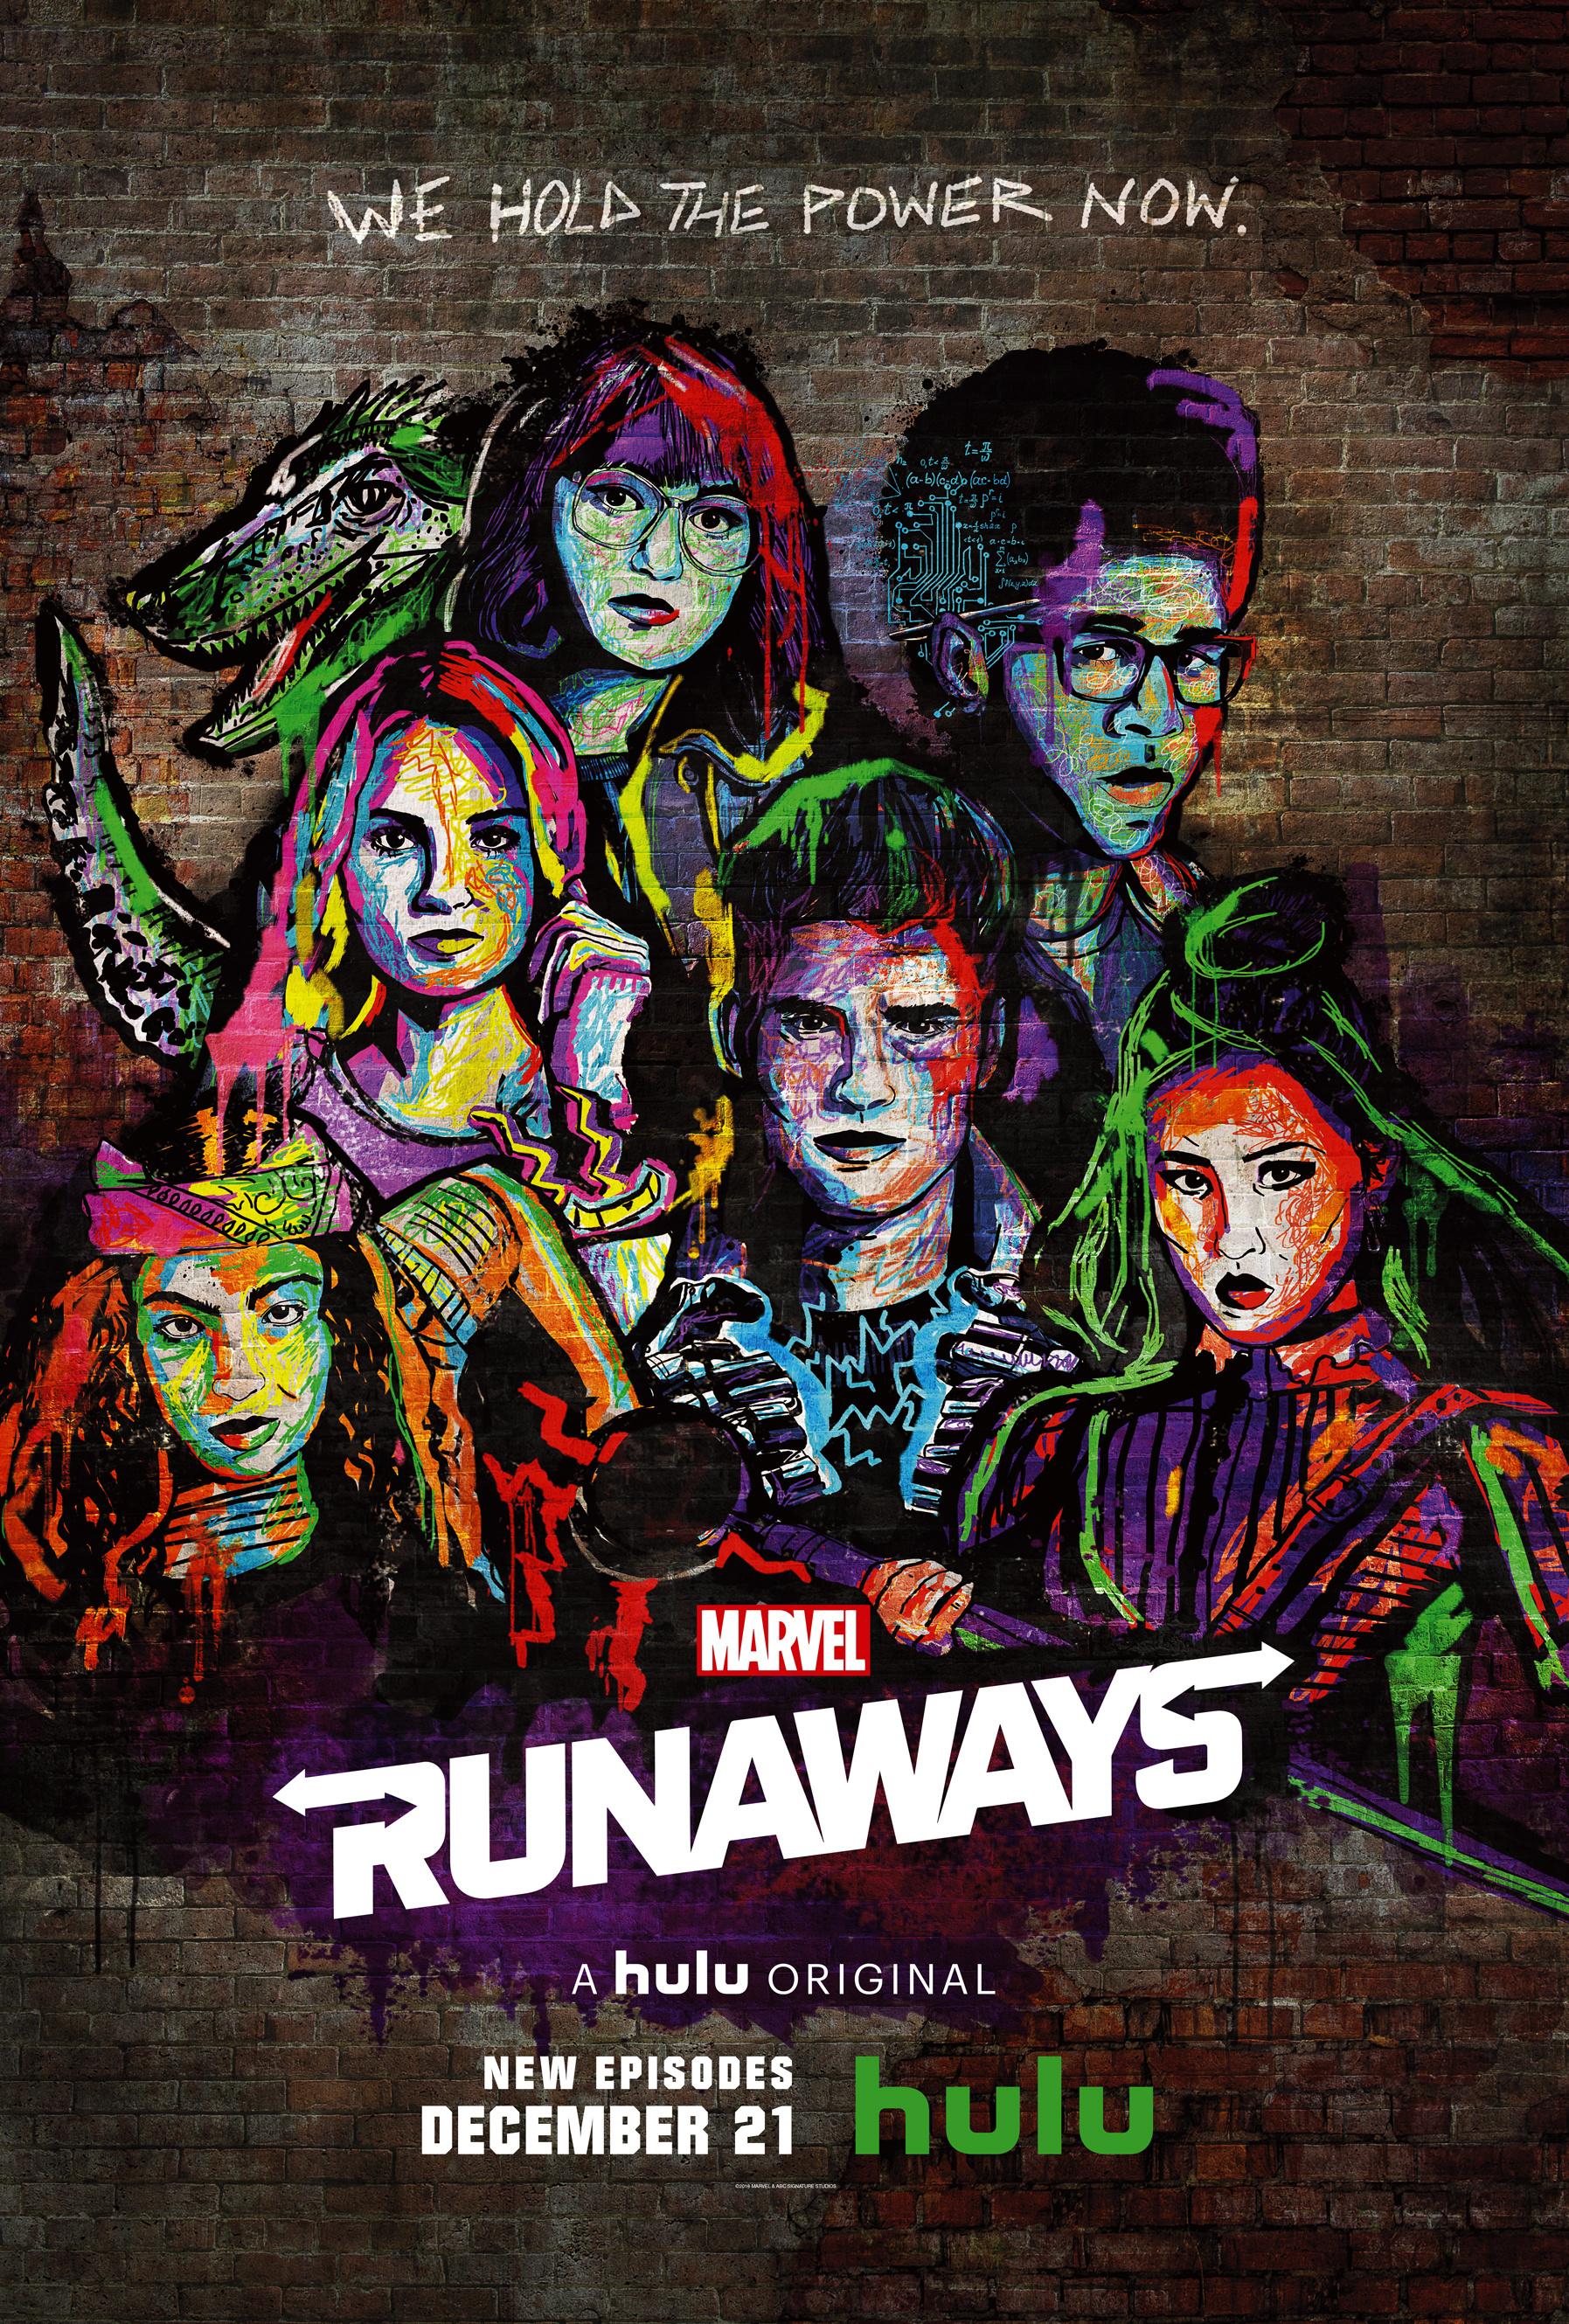 Thumbnail for Runaways - Season 2